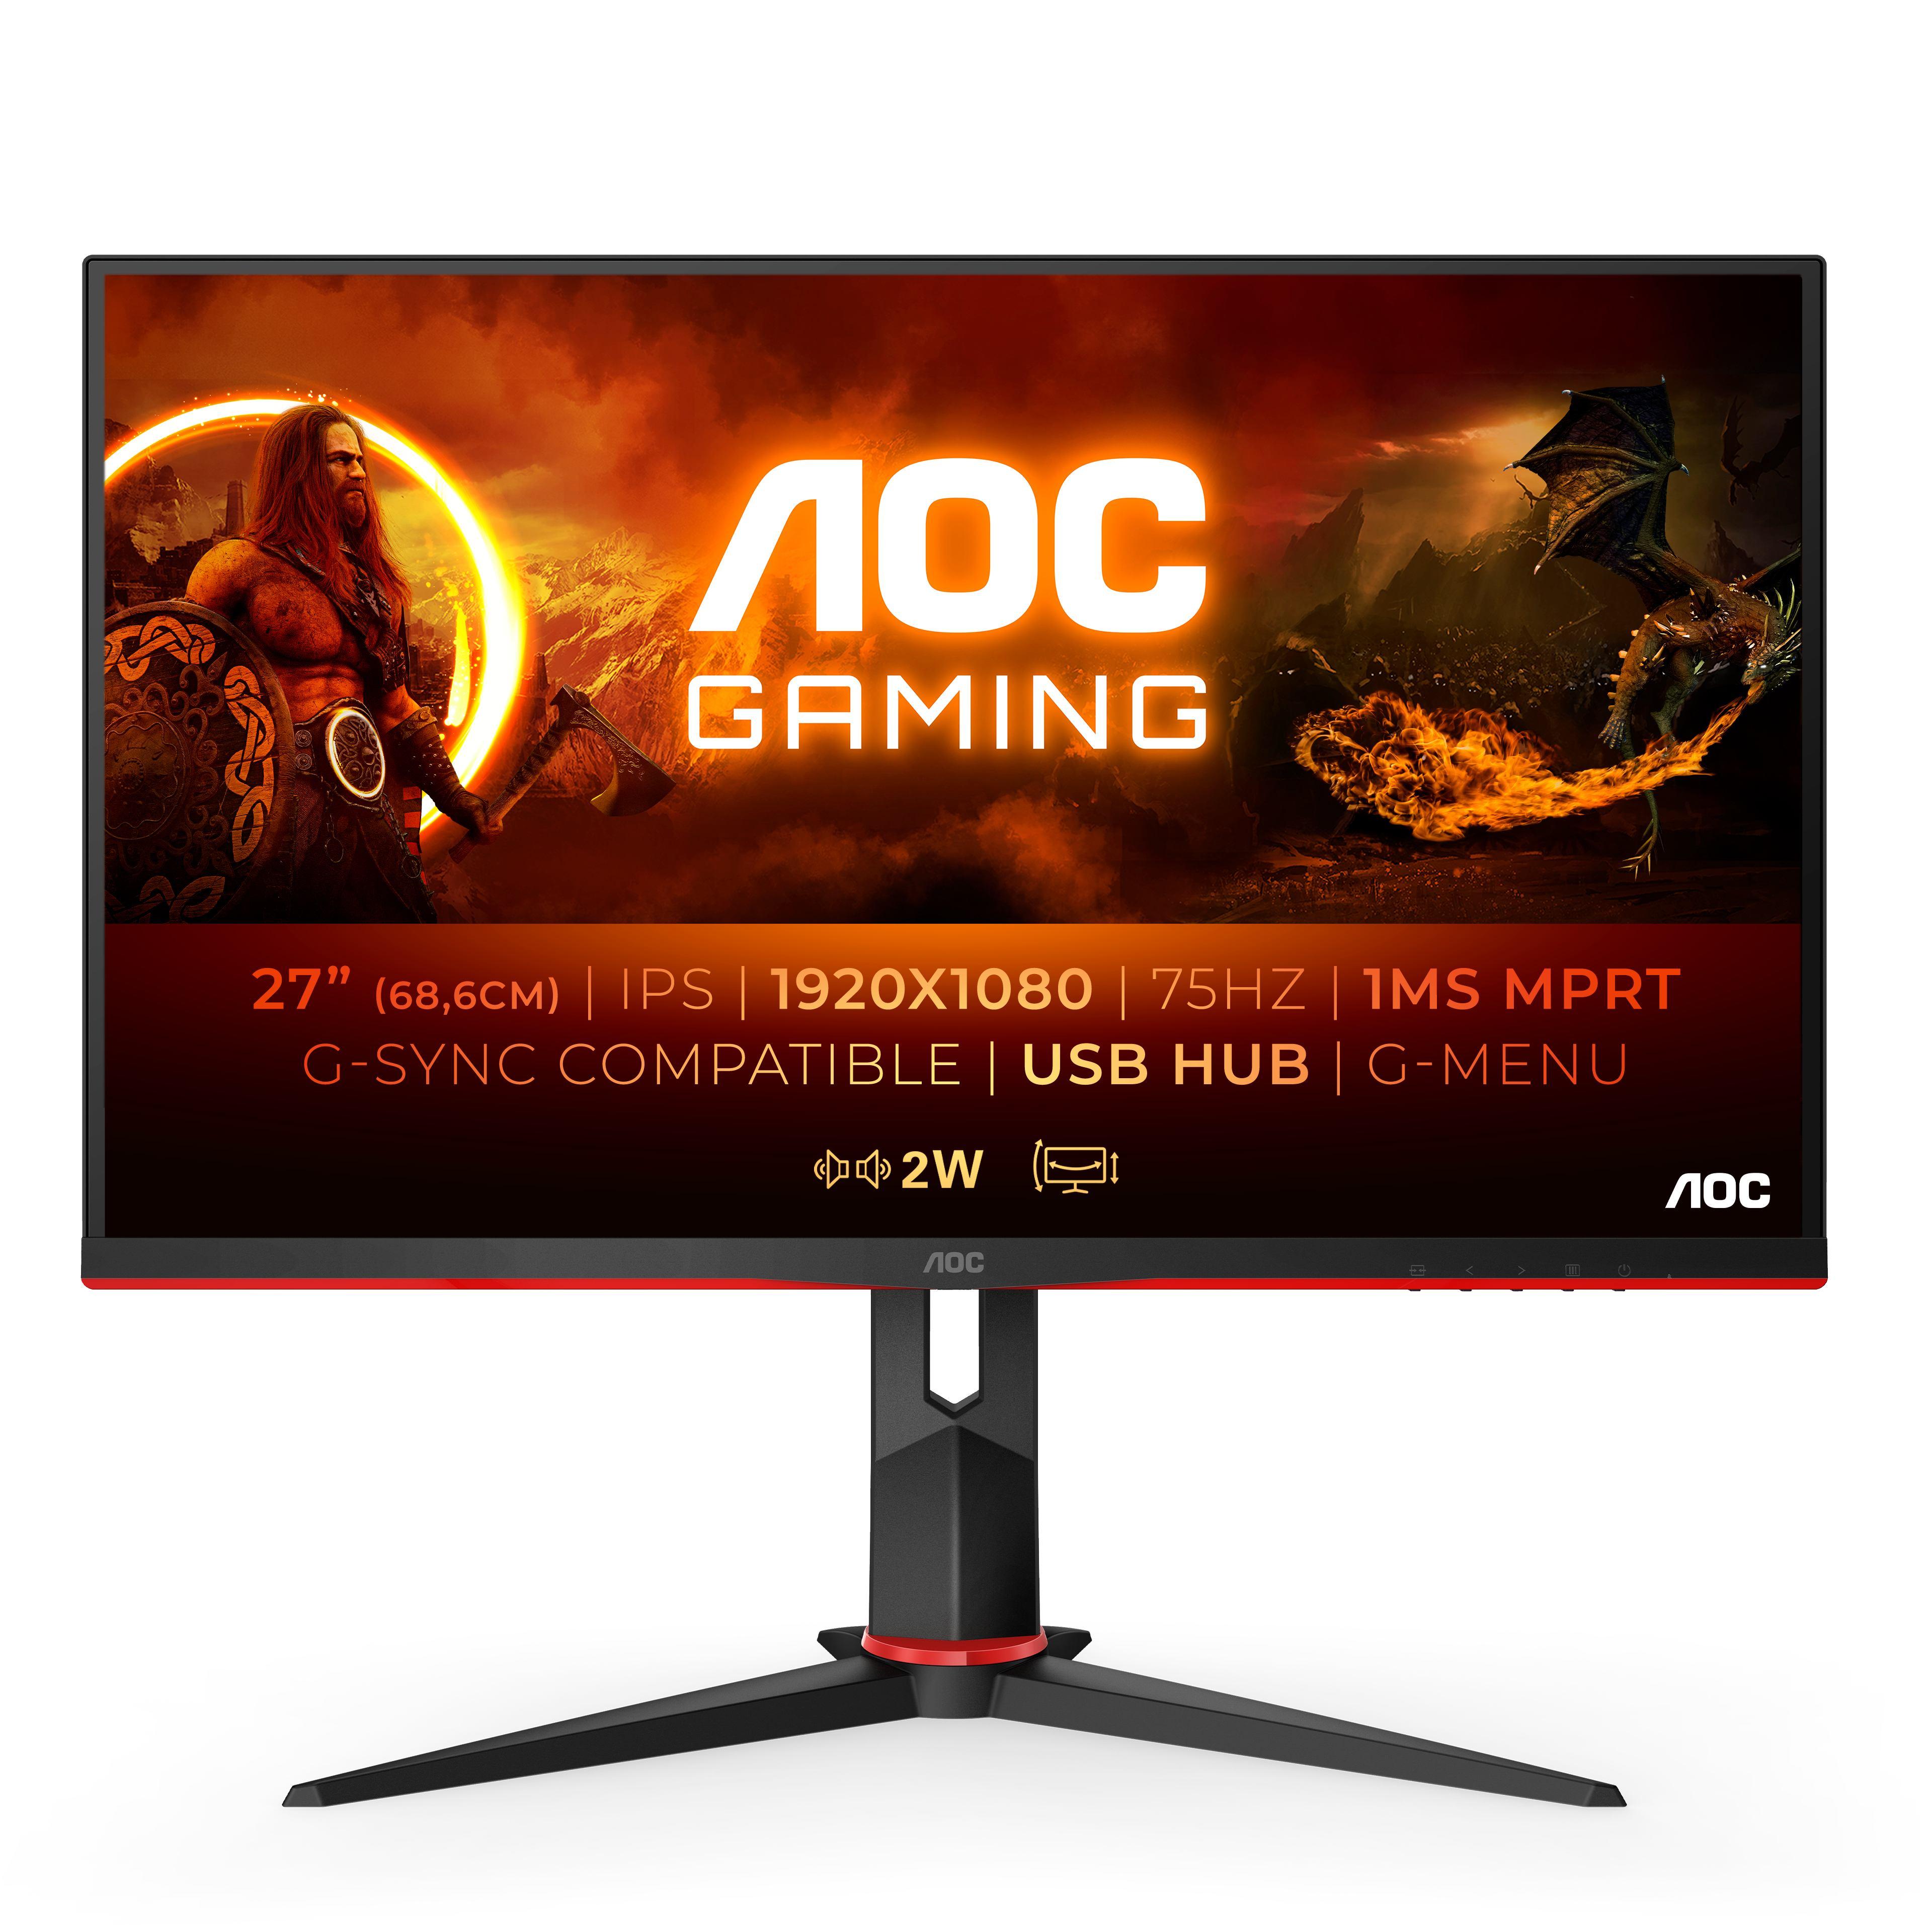 2081568-AOC-27G2U5-BK-monitor-piatto-per-PC-68-6-cm-27-1920-x-1080-Pixel-Full